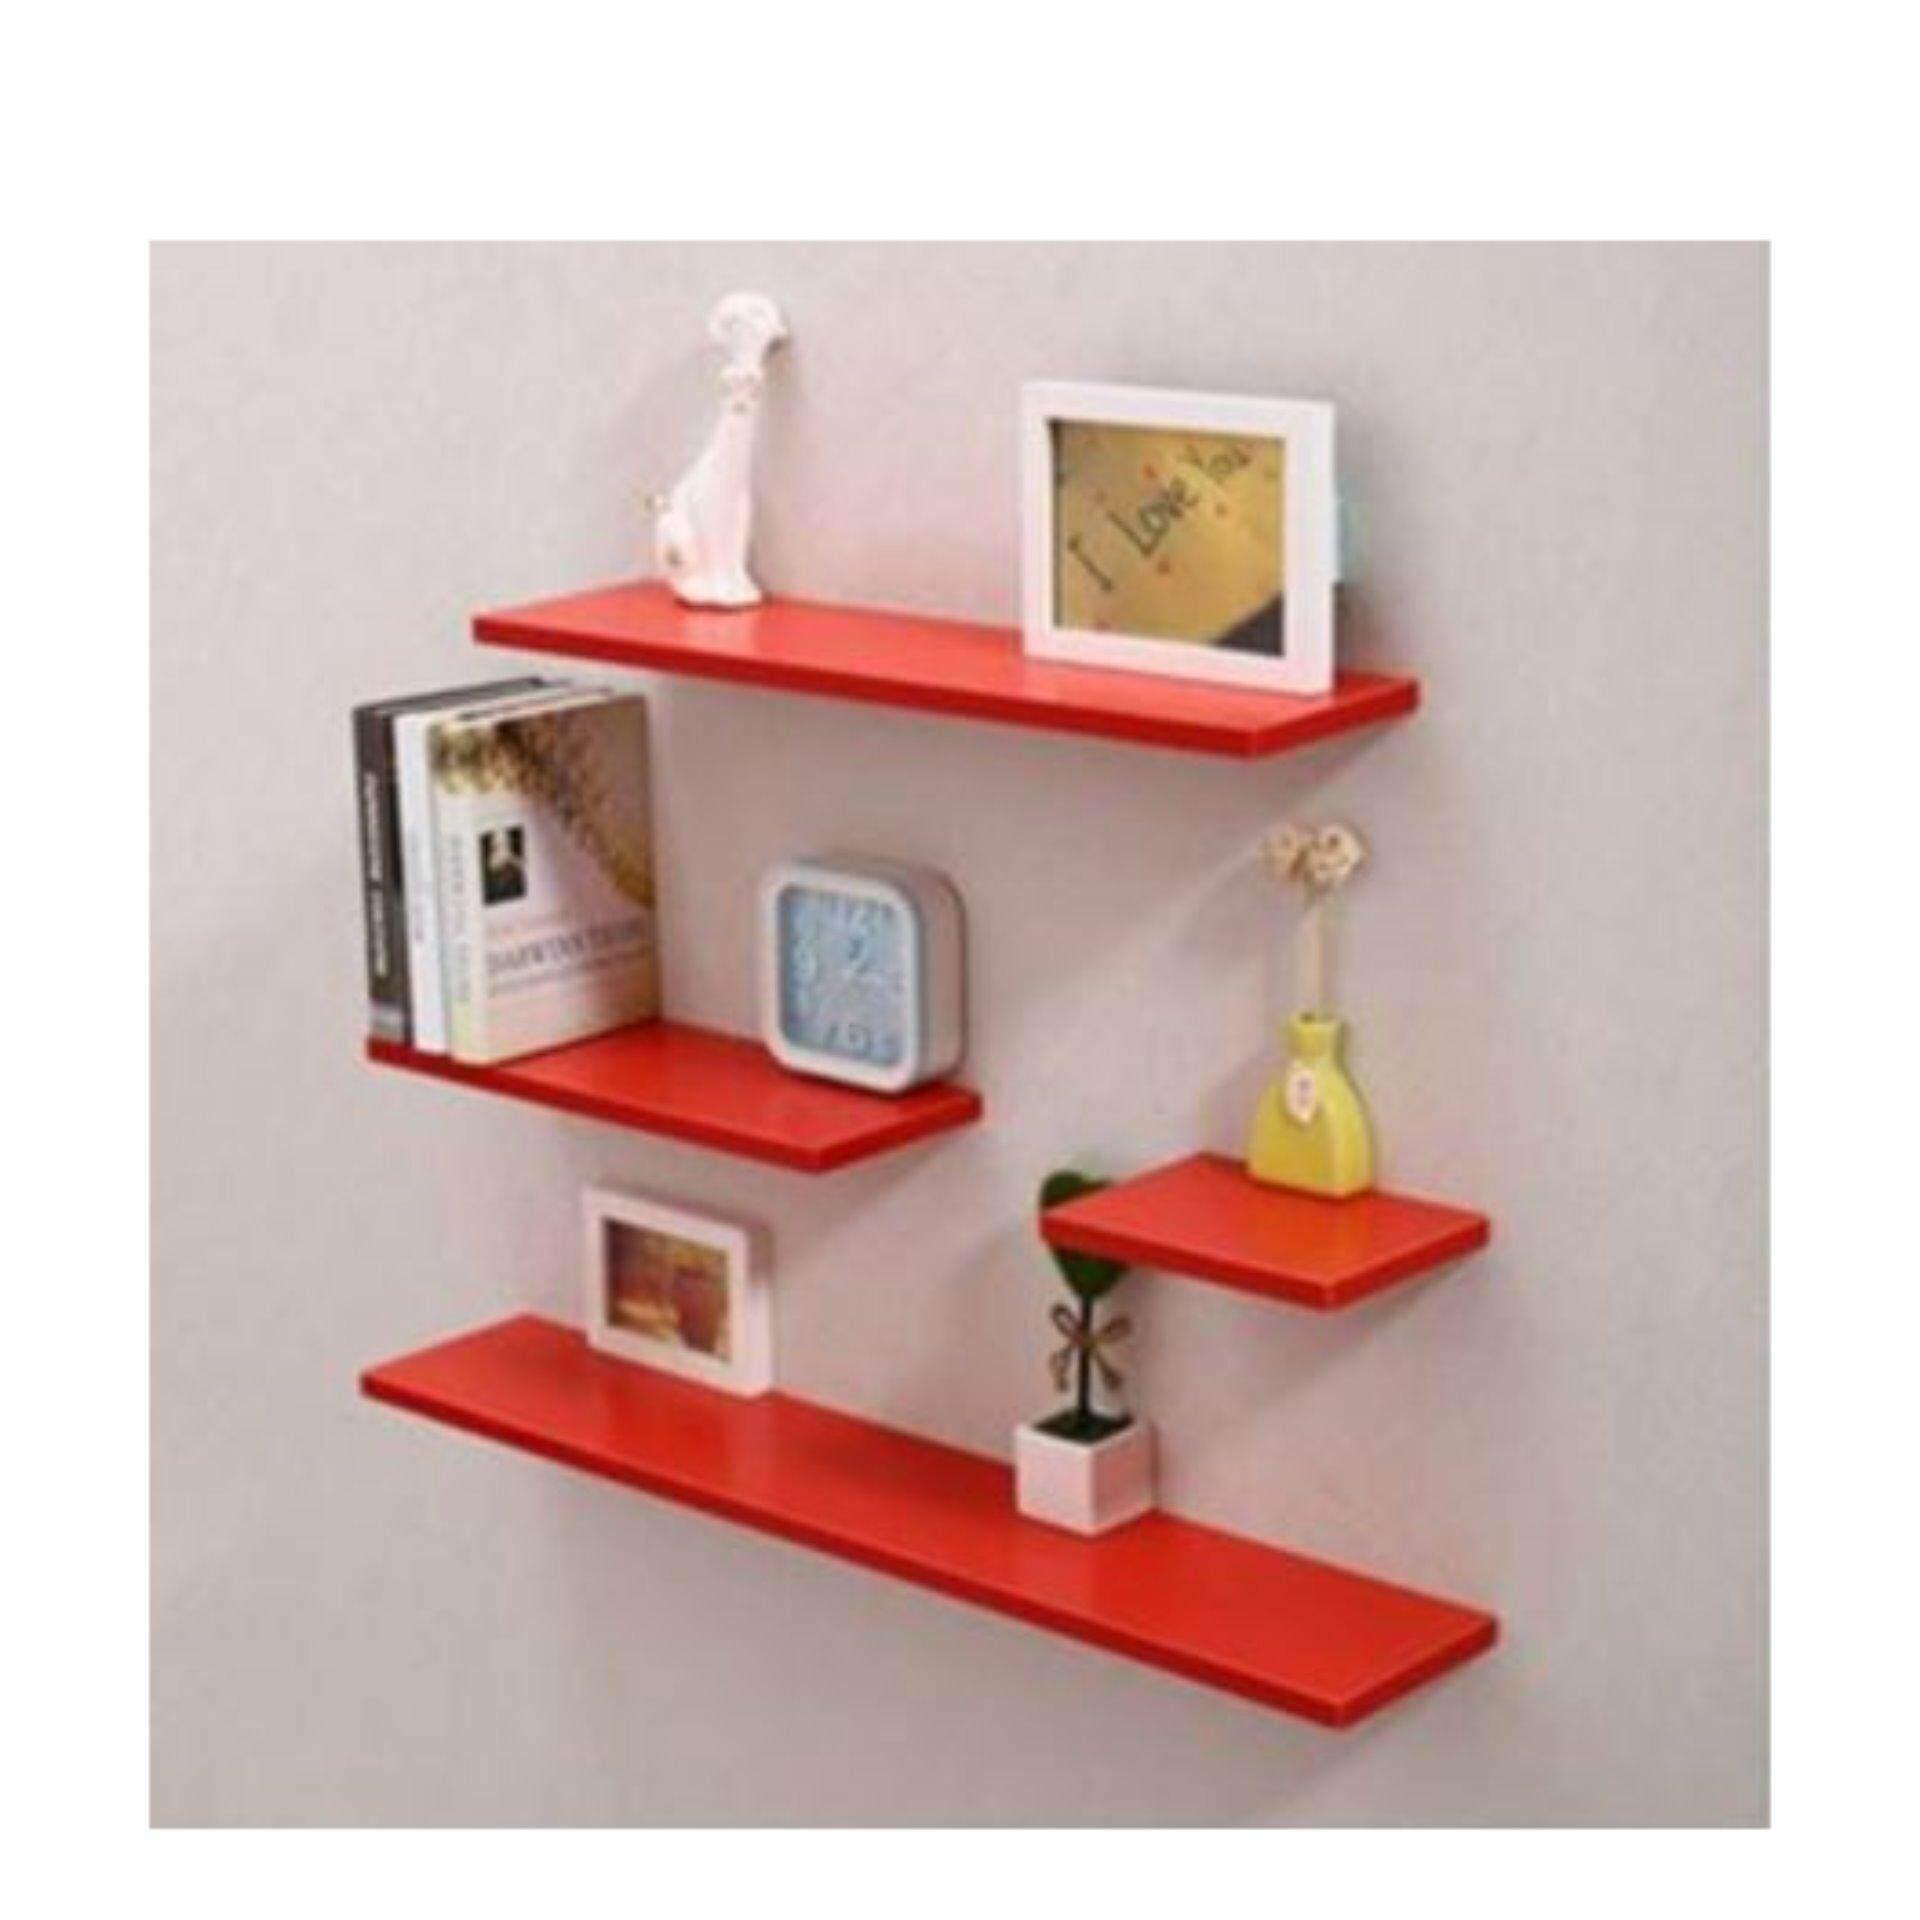 Set of 4 Horizontal Shape Wall Mounted Shelves Design A Red